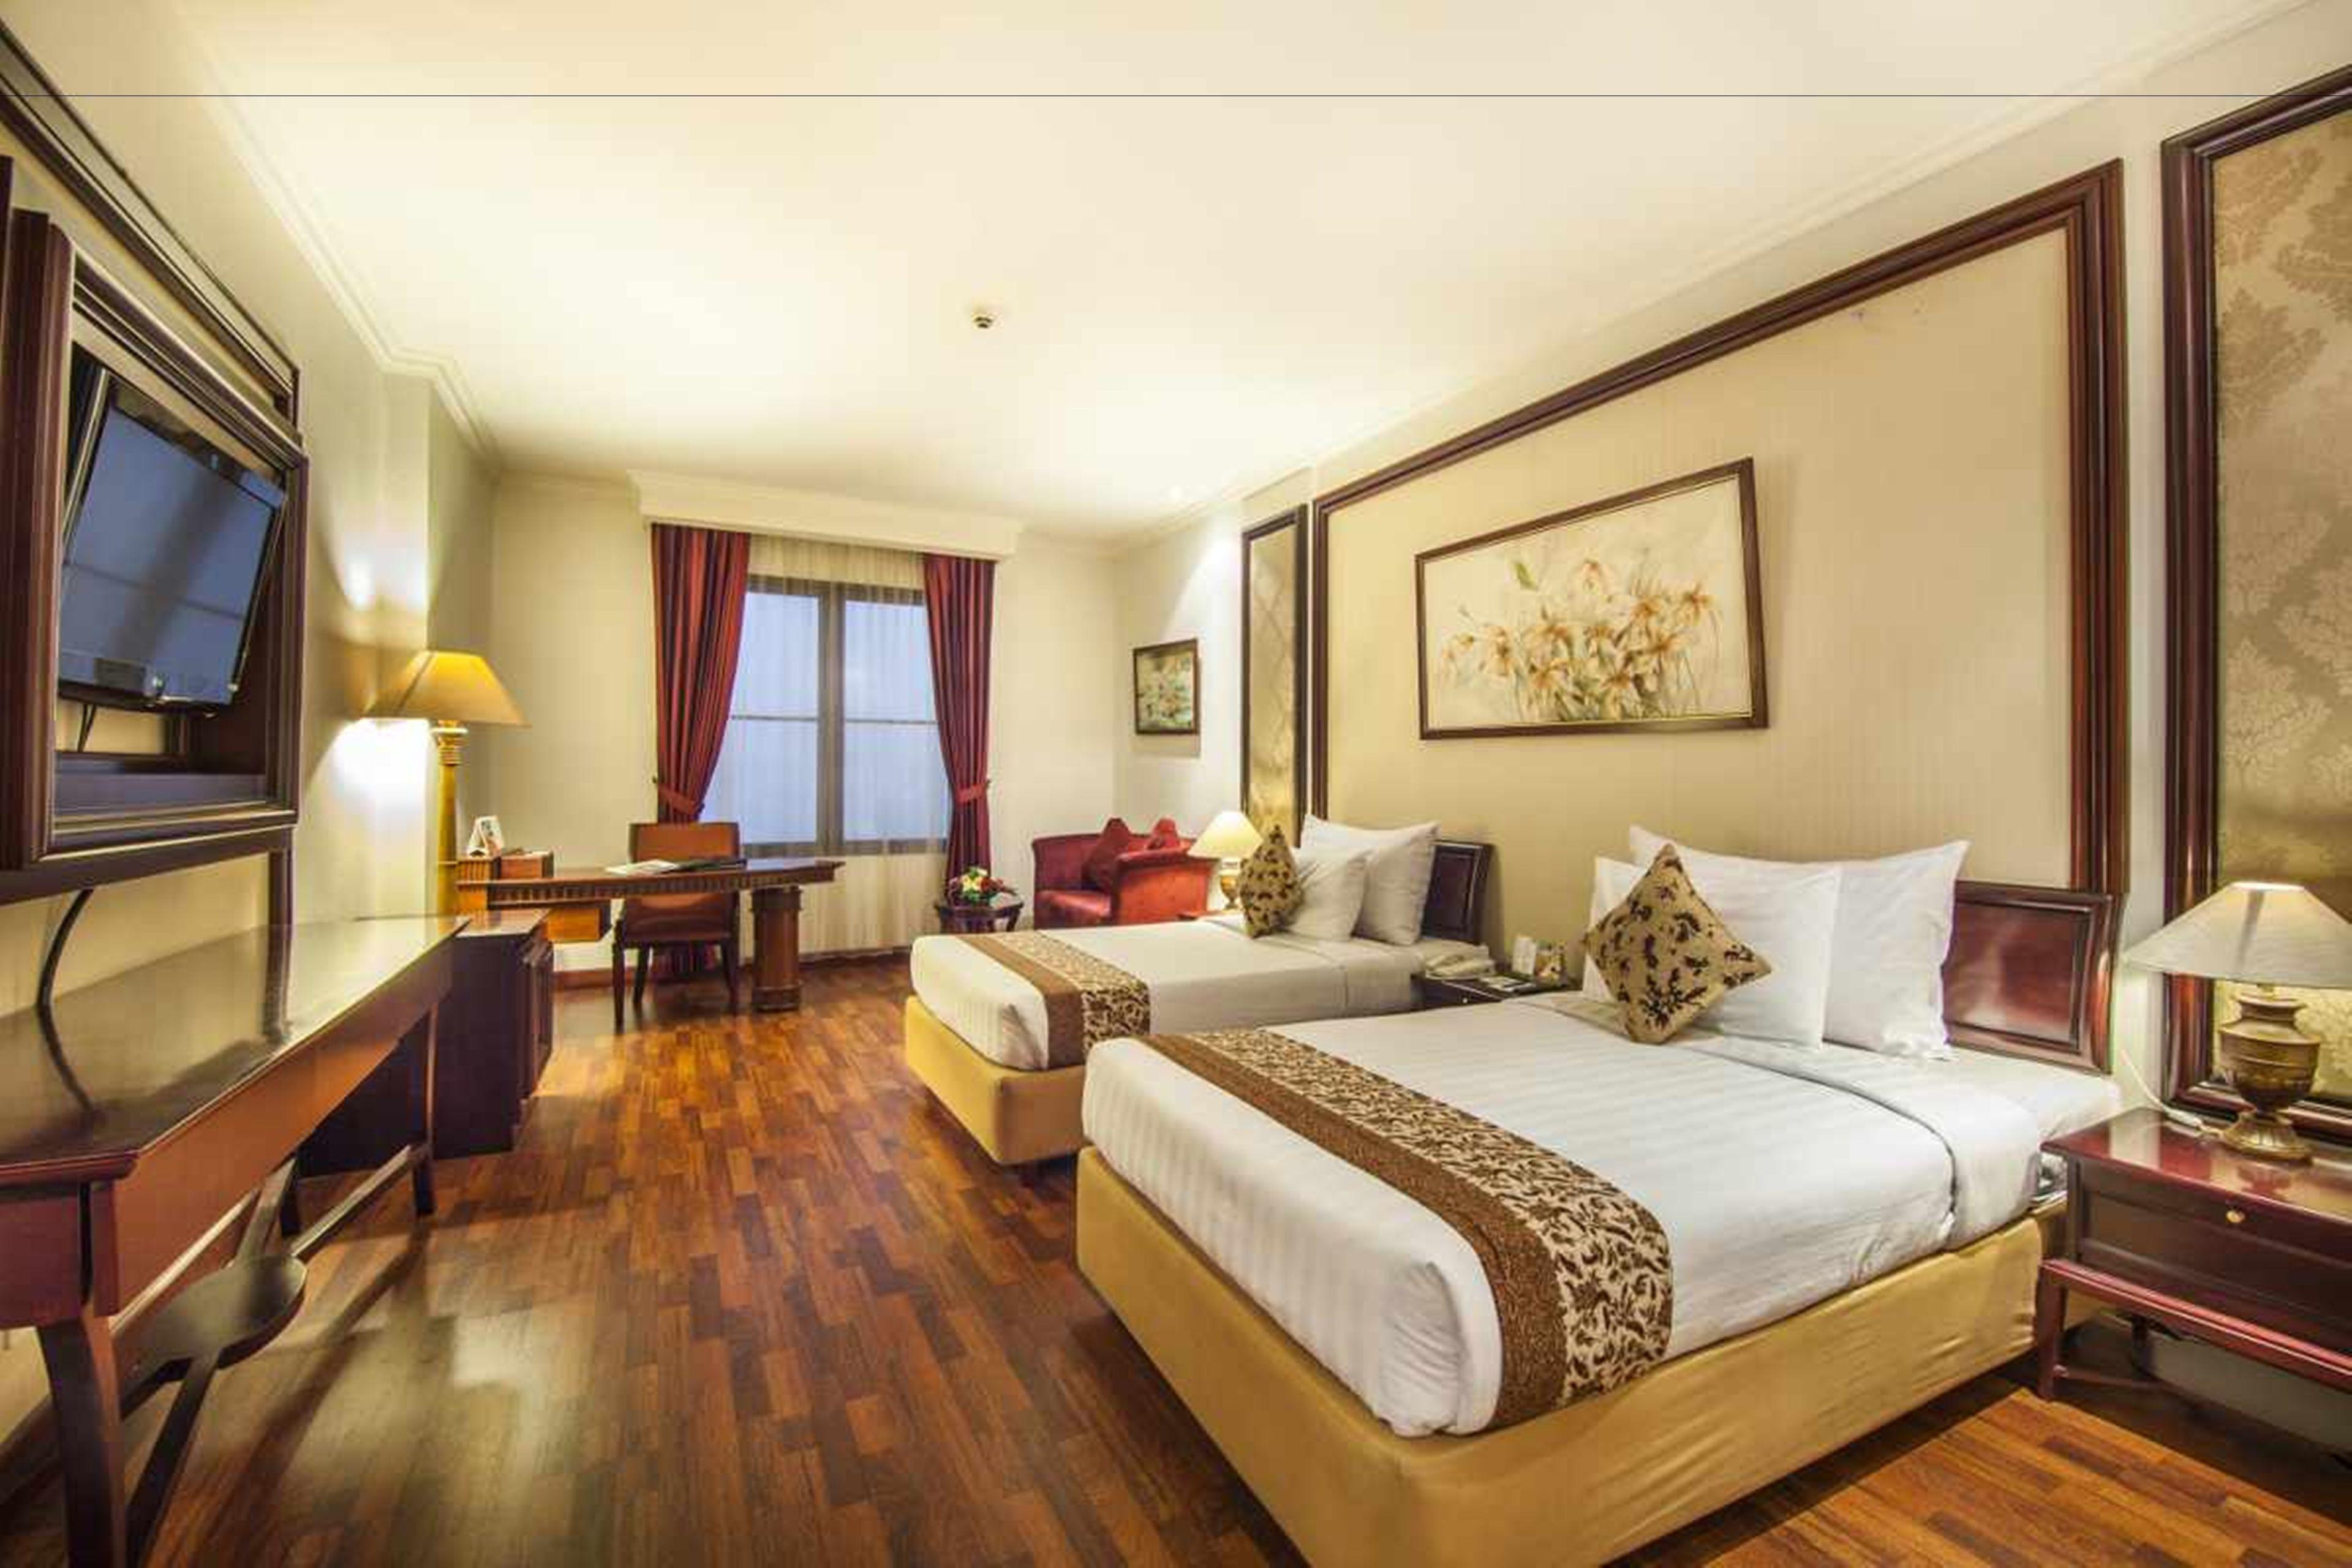 Courtesy of Arion Swiss-Belhotel Bandung / Expedia